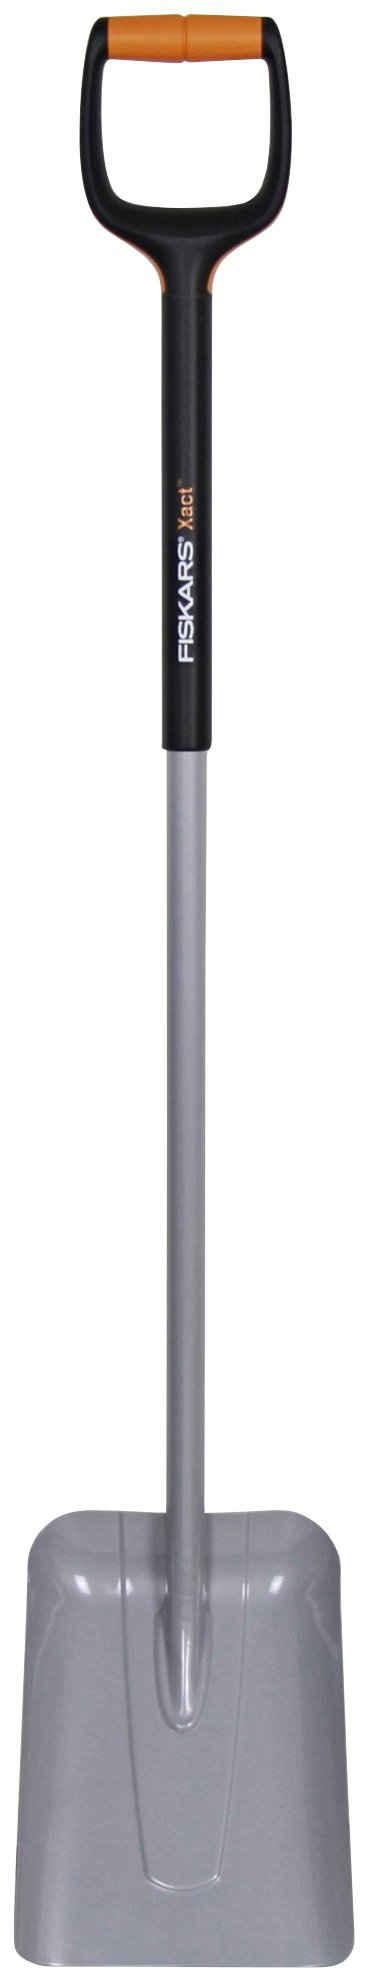 Fiskars Schaufel »Xact«, 130 cm Gesamtlänge